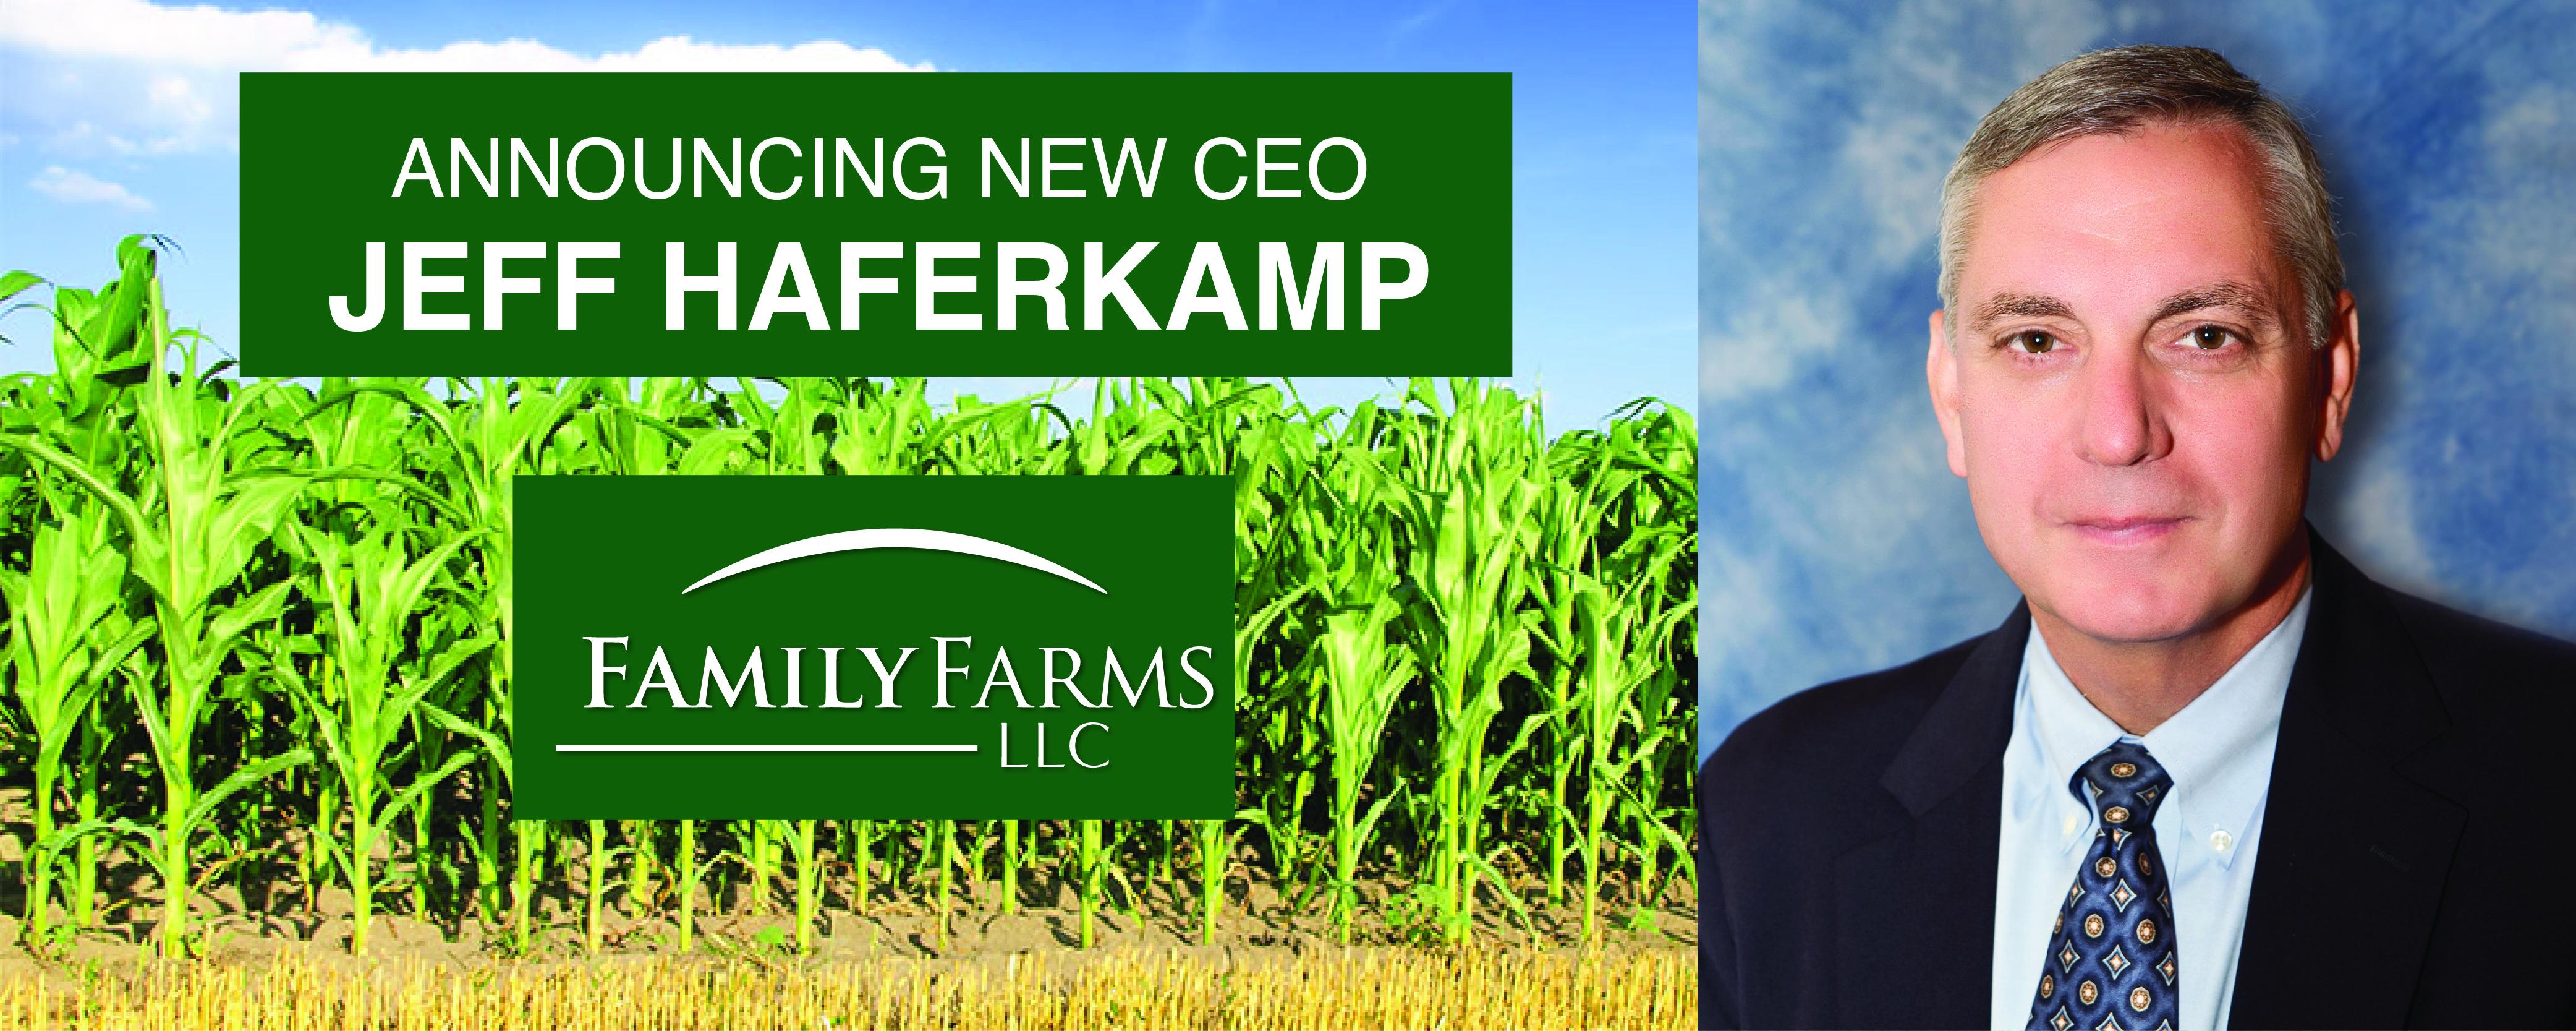 Family Farms LLC Appoints Jeff Haferkamp as CEO